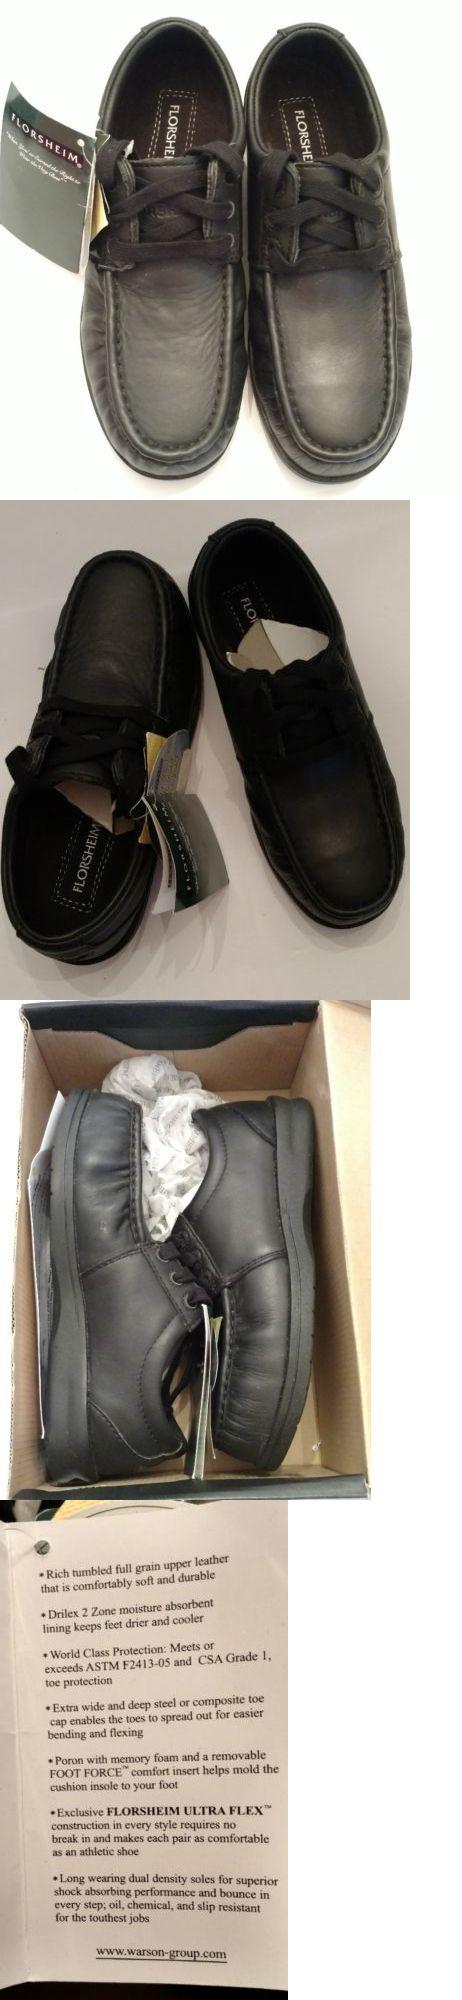 Occupational 53548: Florsheim Fs20 Women S Occupational Slip Resistant Steel Toe Shoe Size 6.5W New -> BUY IT NOW ONLY: $39.95 on eBay!